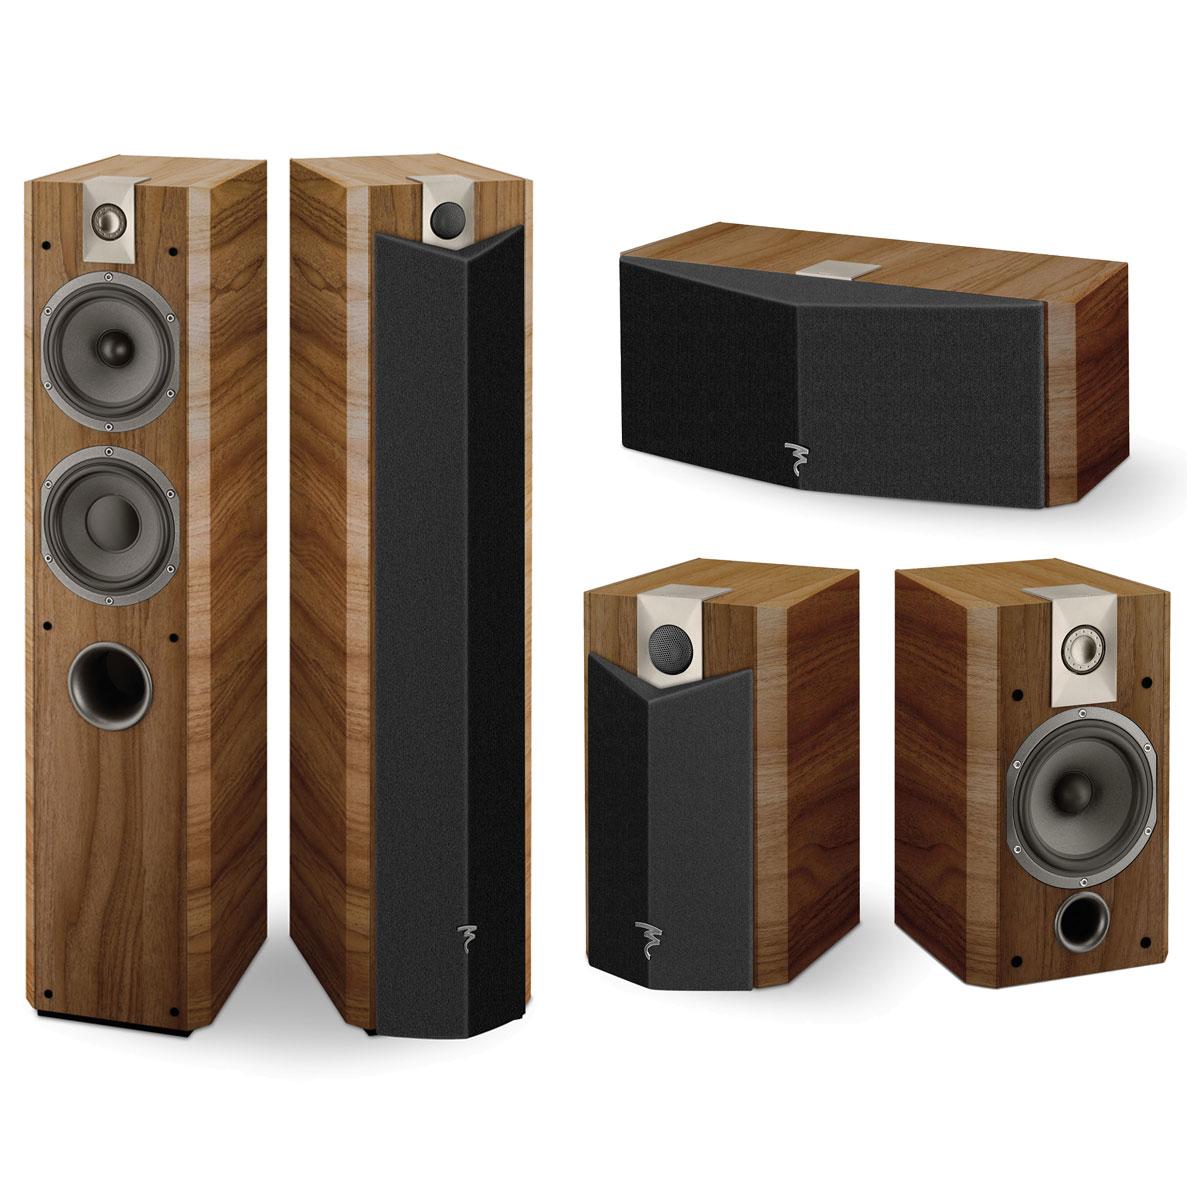 focal chorus 716 v cigar focal chorus 705 v cigar focal chorus cc 700 v cigar enceintes. Black Bedroom Furniture Sets. Home Design Ideas